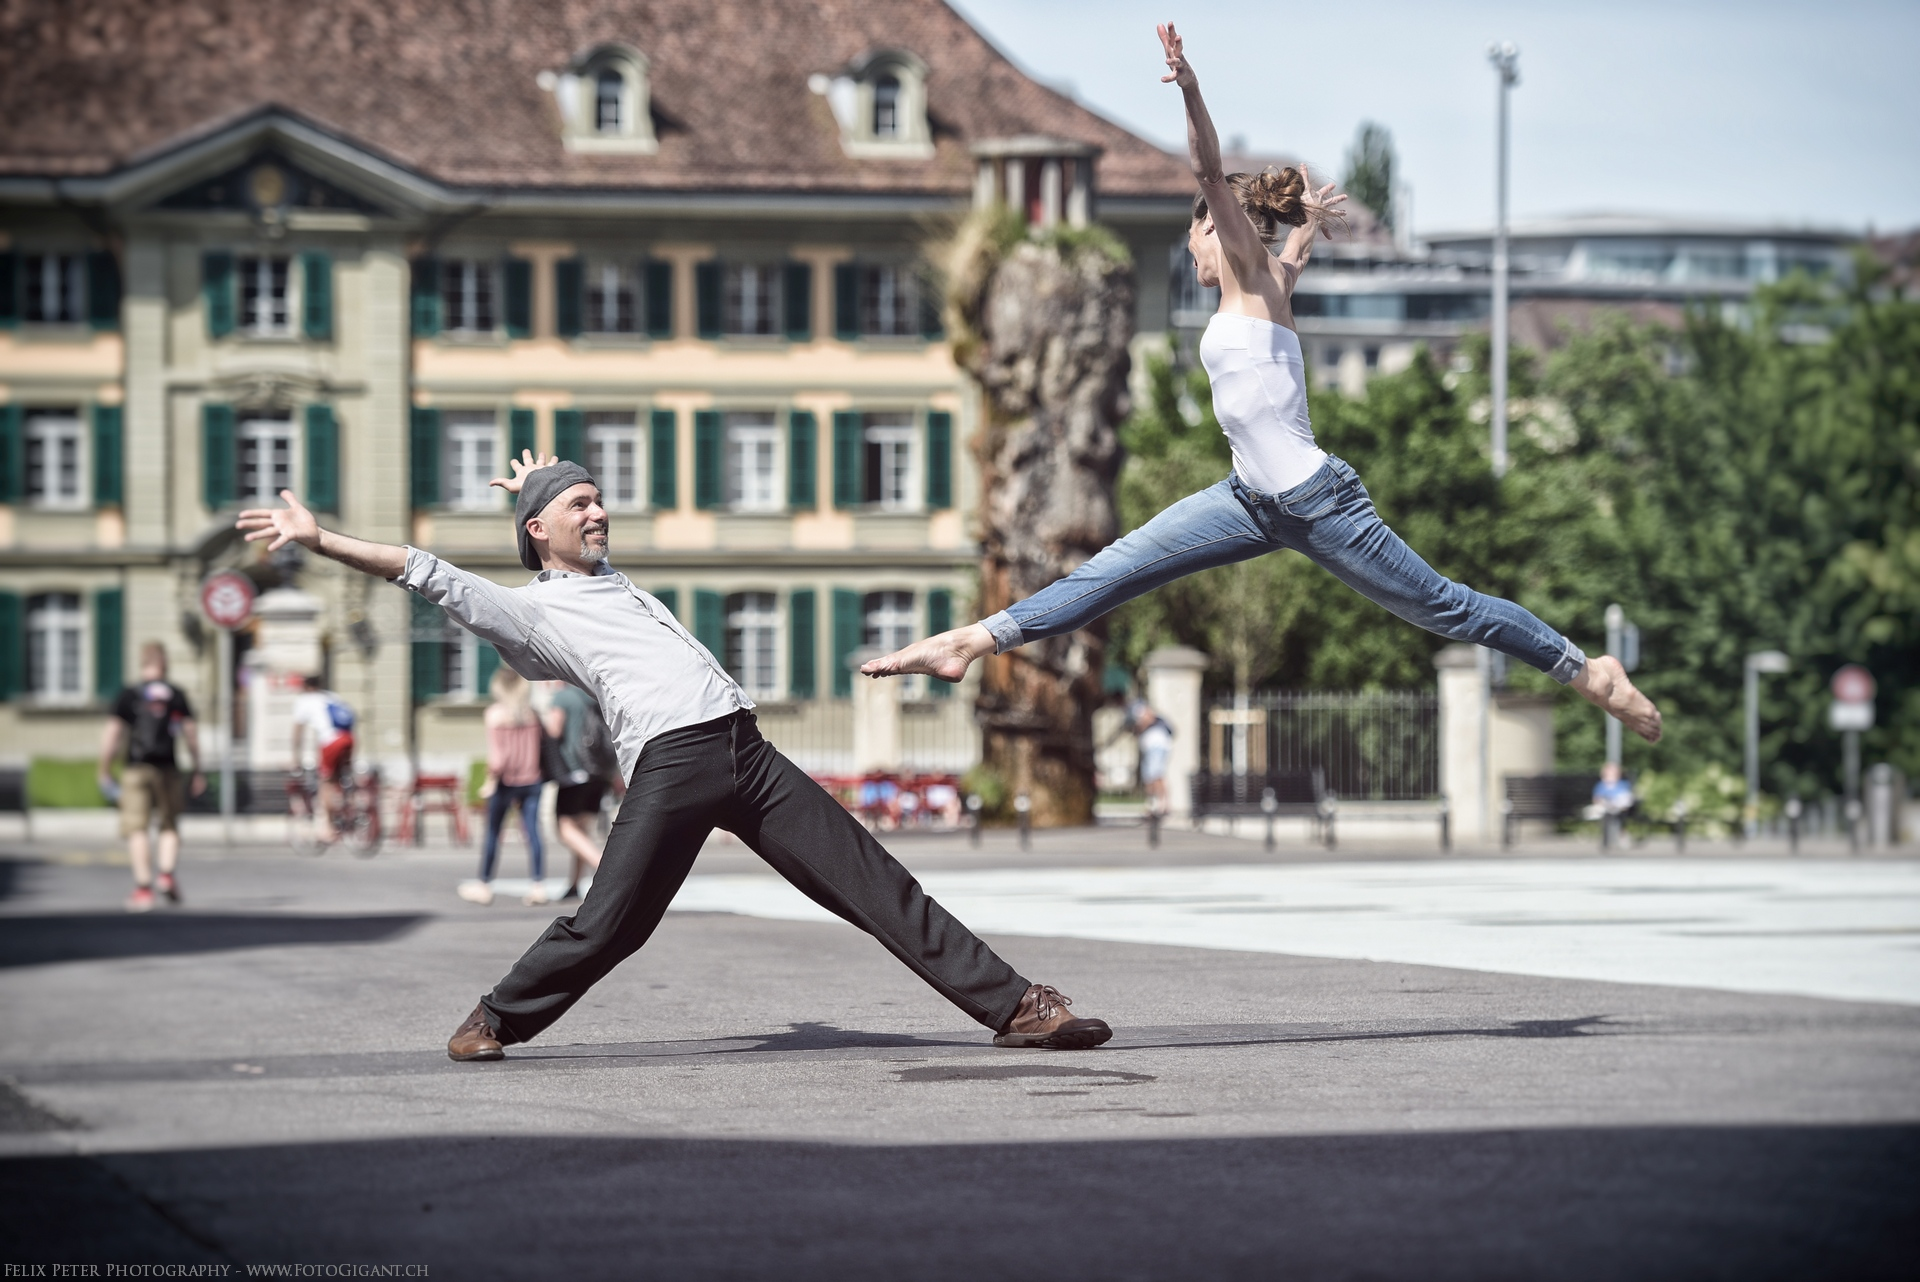 Felix-Peter-Yoga-Pilates-Dance-Fotografie_Bern_050.jpg